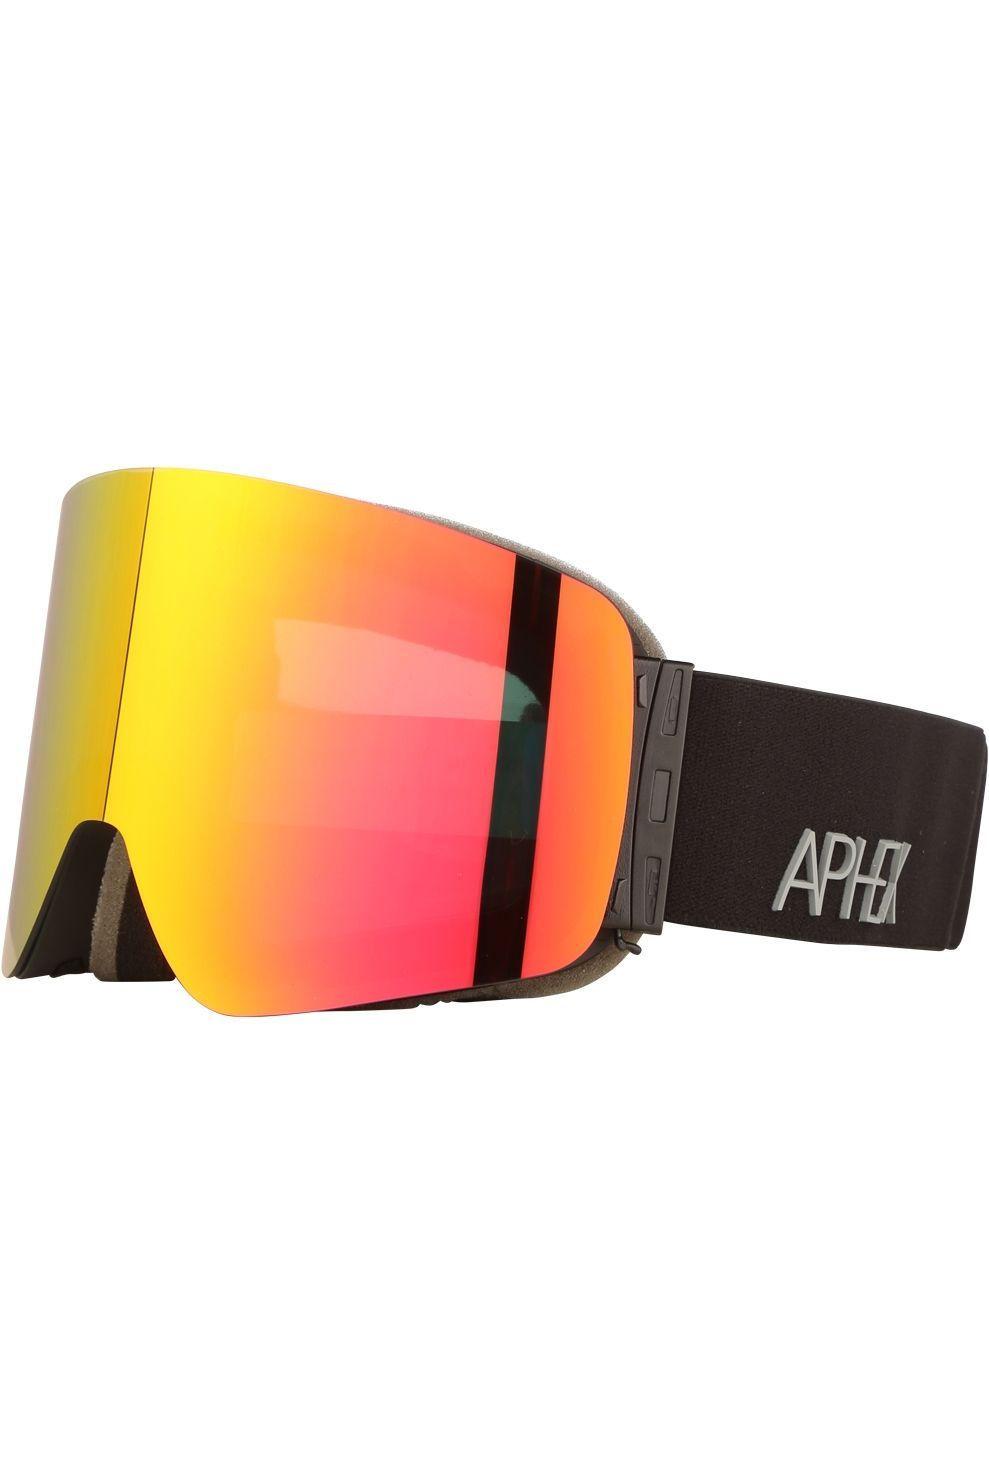 Aphex Skibril Oxia - Zwart/Rood